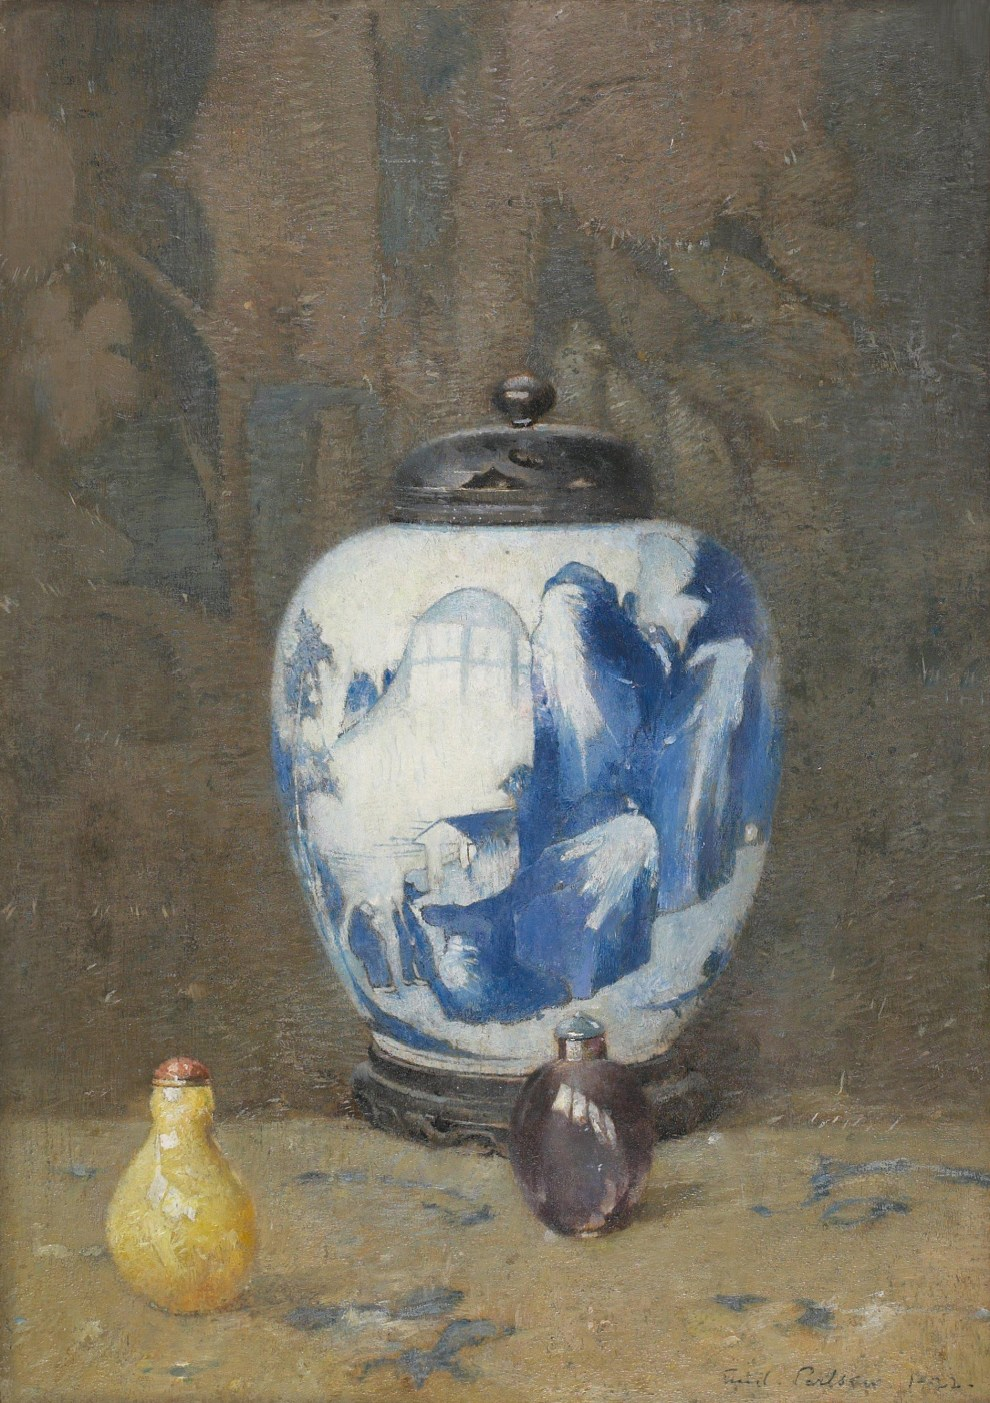 Emil Carlsen : Still life, chinese vase, 1922.